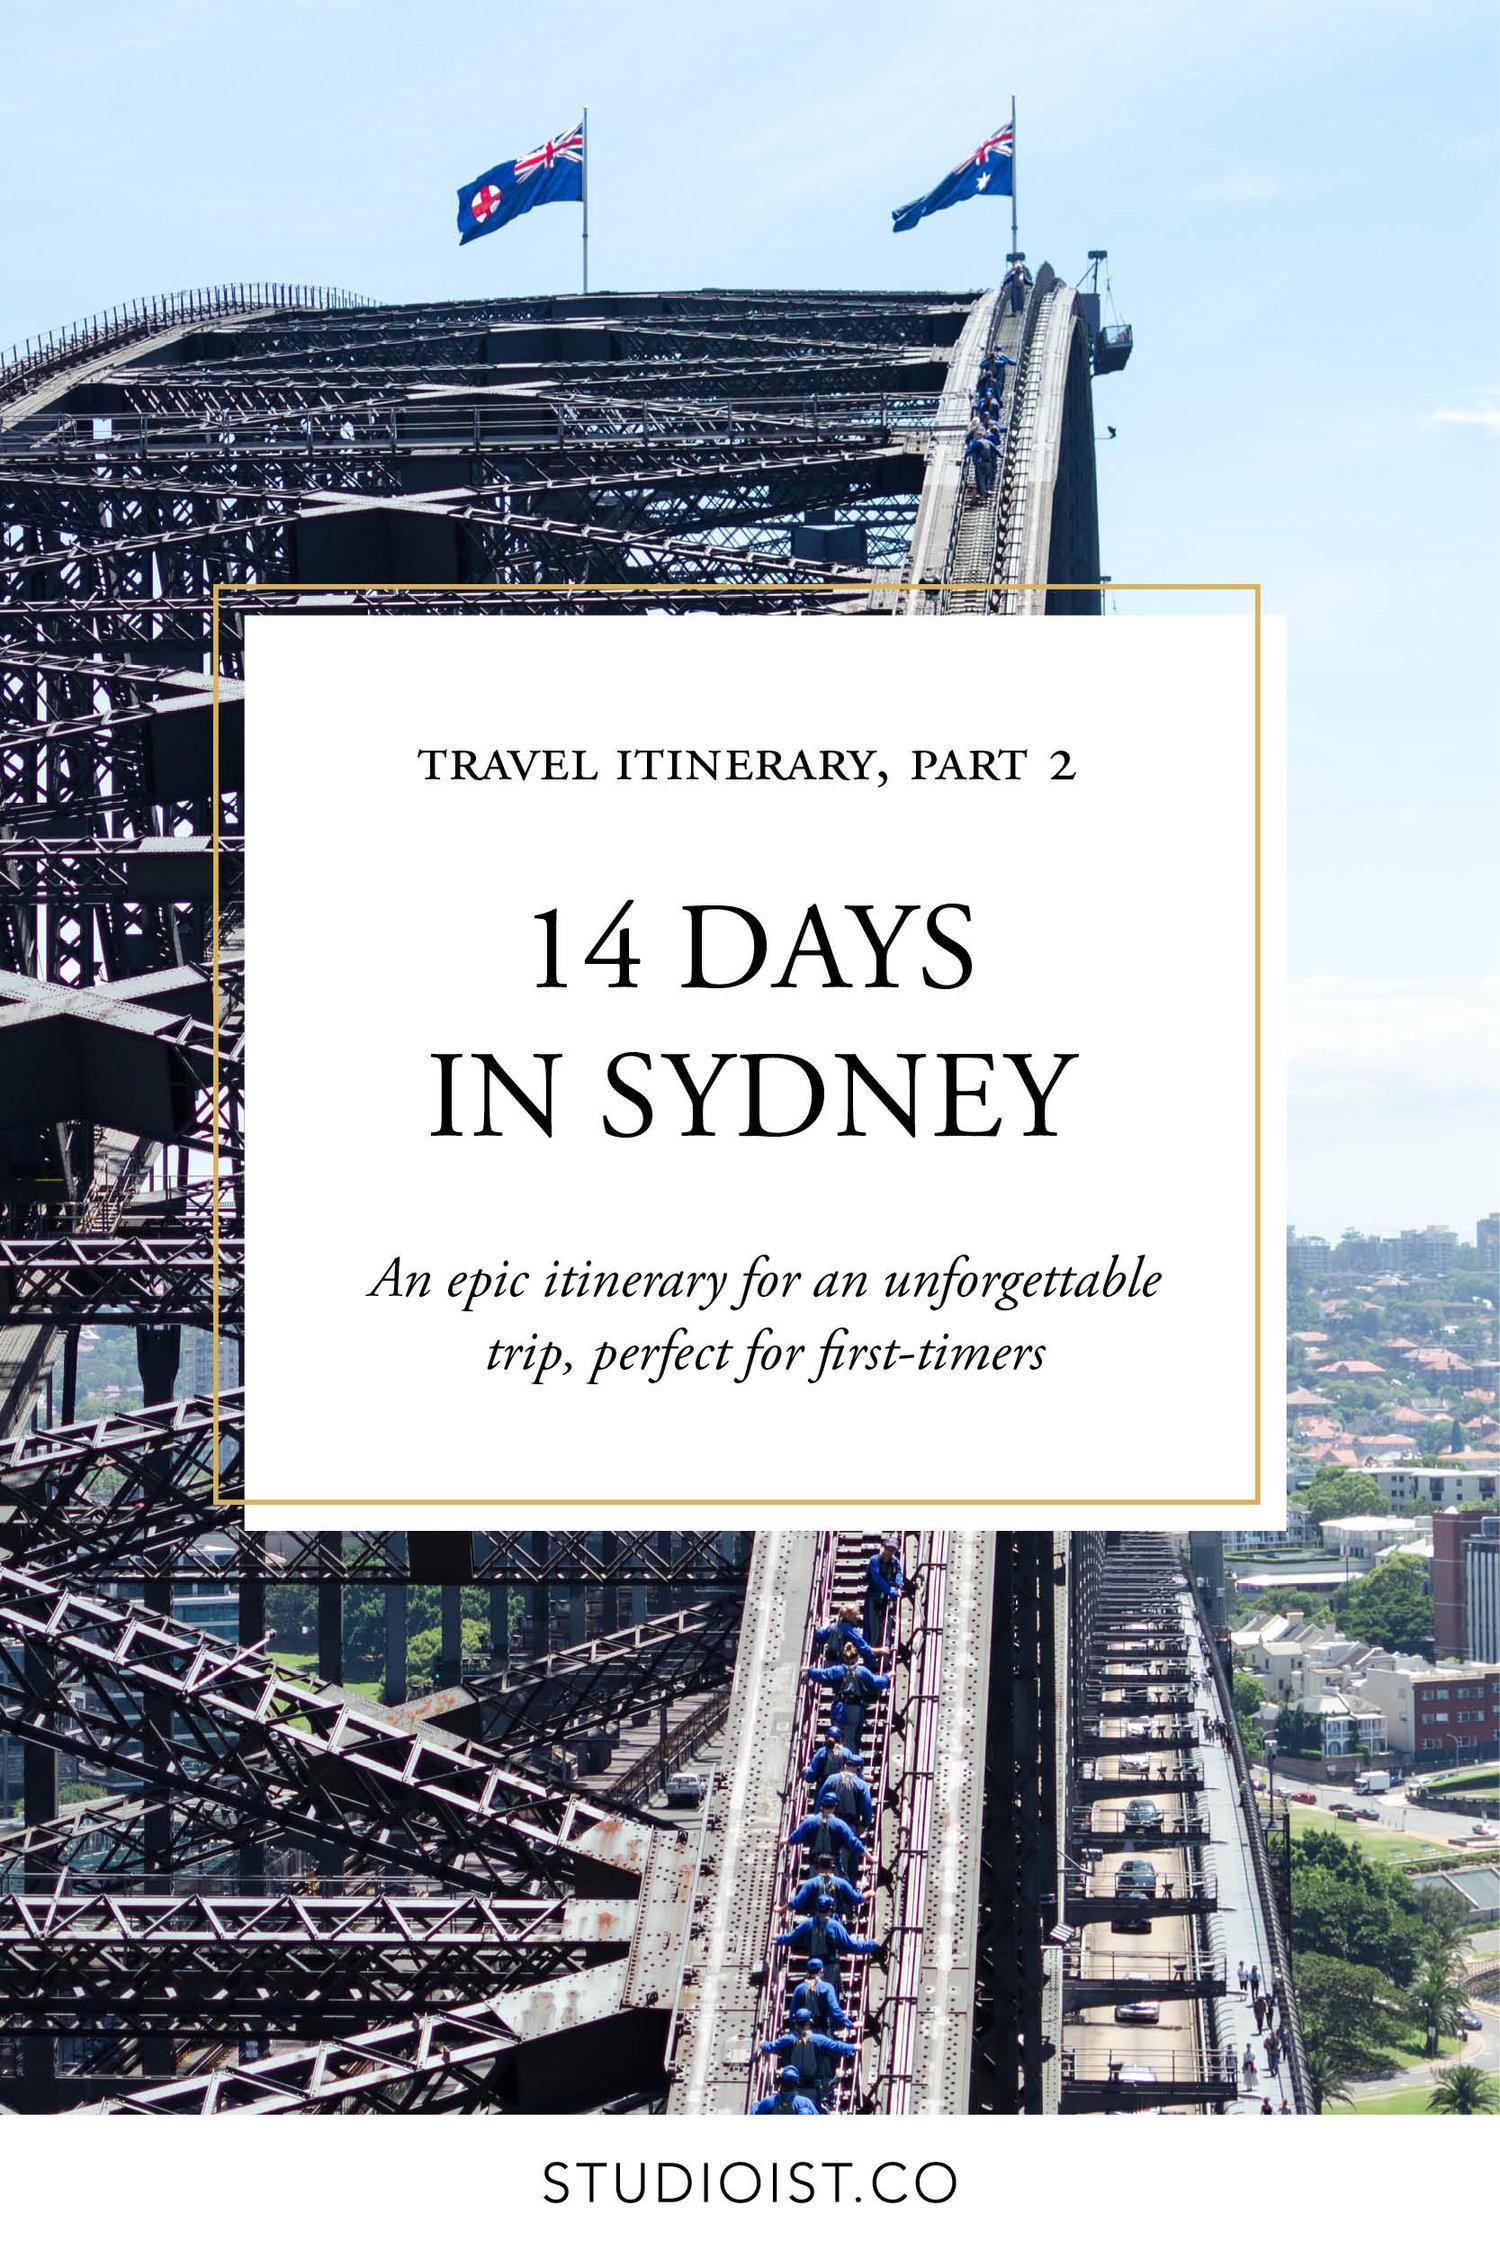 8f9e9c8bd3d Travel Itinerary - 14 Days in Sydney Australia.jpg